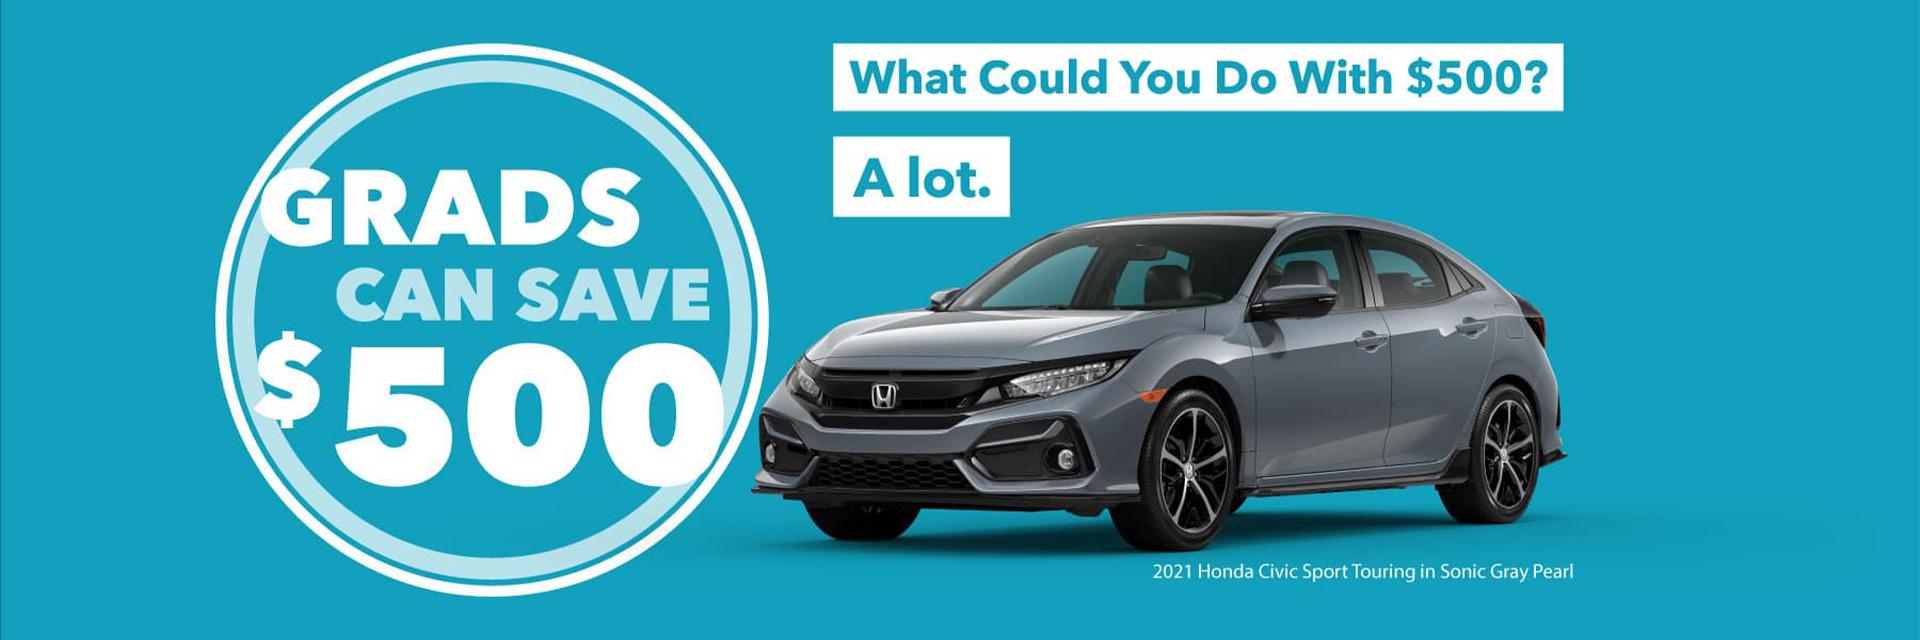 $500 College Grad Offer Honda Dealer St. Louis